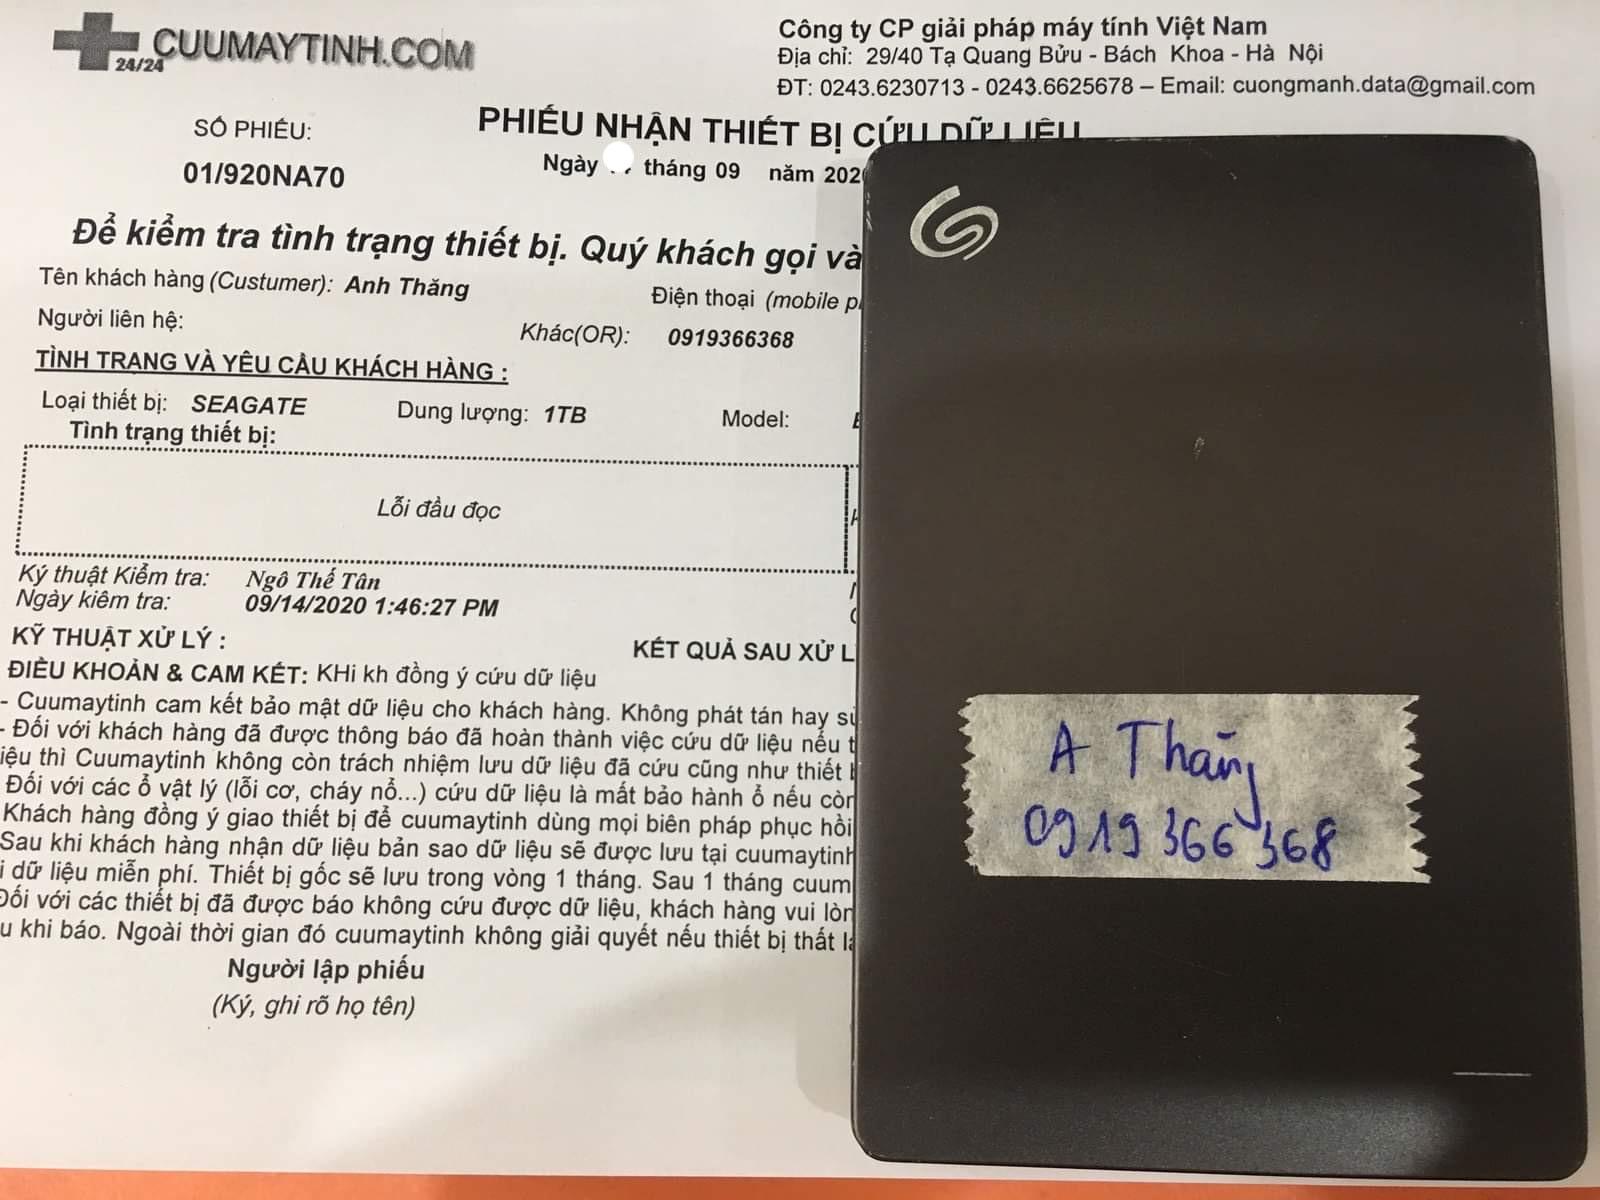 Cứu dữ liệu ổ cứng Seagate 1TB lỗi đầu đọc 21/09/2020 - cuumaytinh